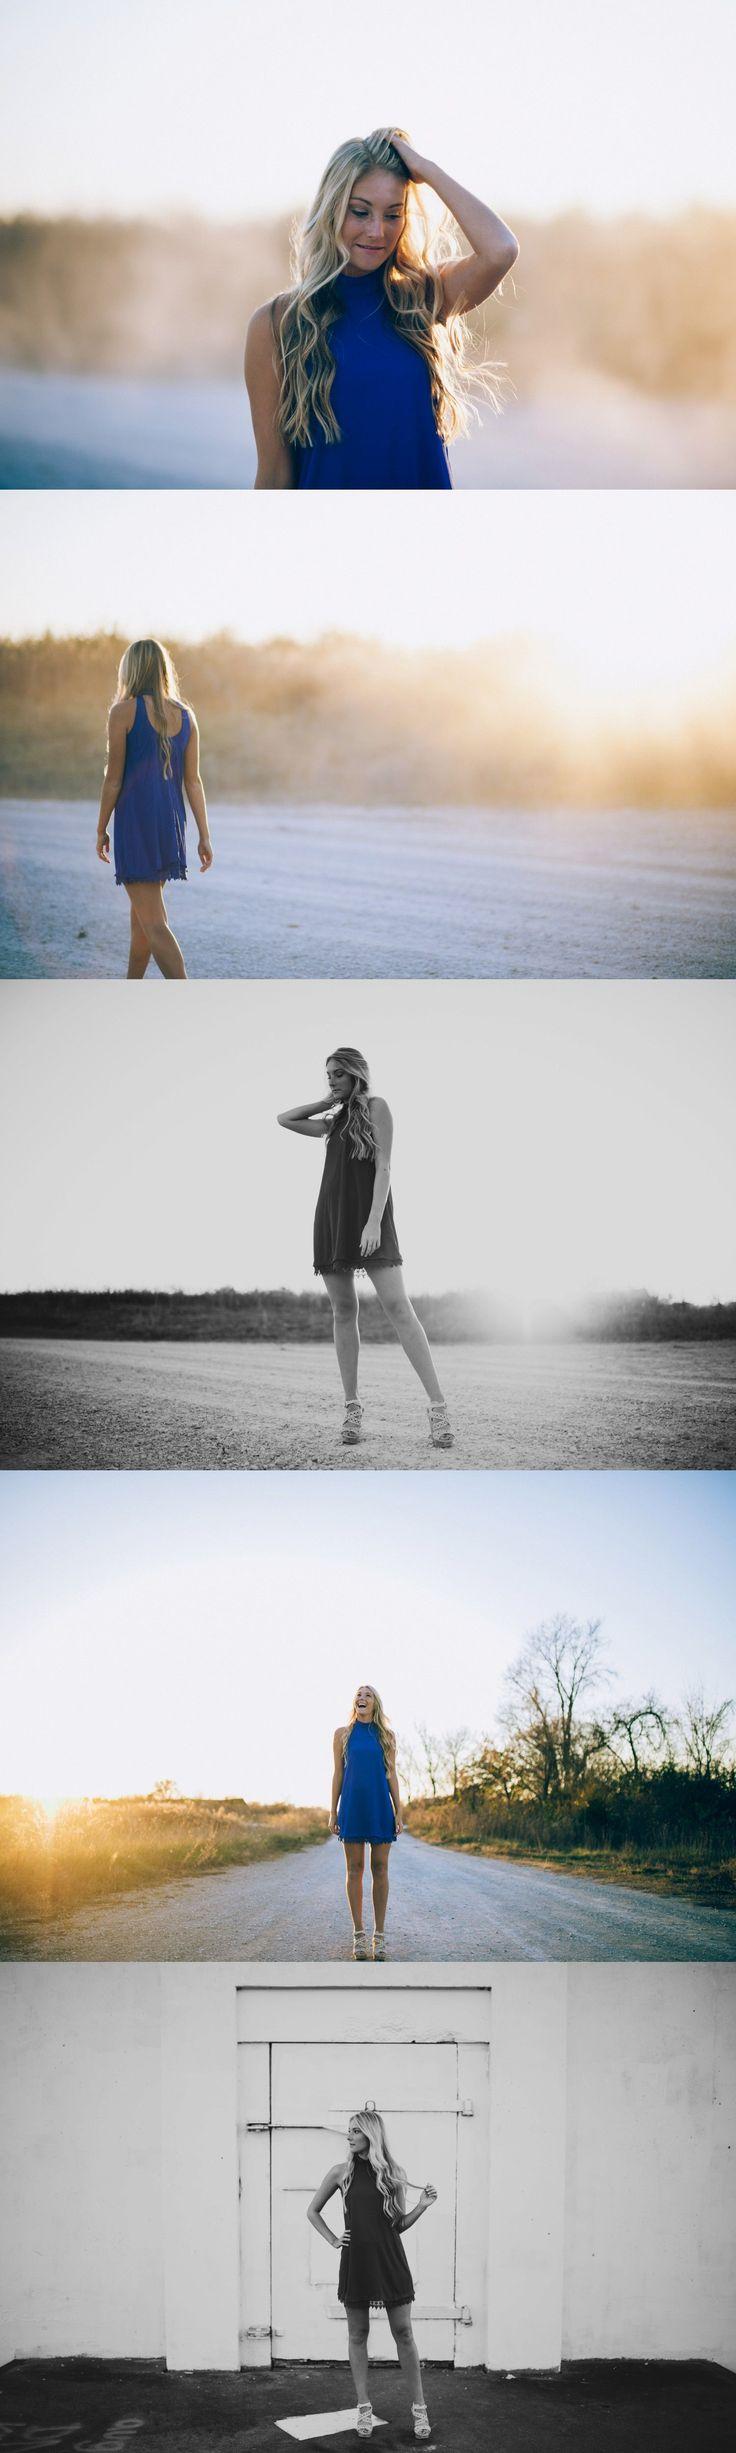 Trendy girl senior photos - St. Louis Senior Pictures - senior girl poses - St. Louis Lifestyle Photographer - Charis Rowland Photography - Bush Wildlife Conservation- indie - modern - hipster - boho